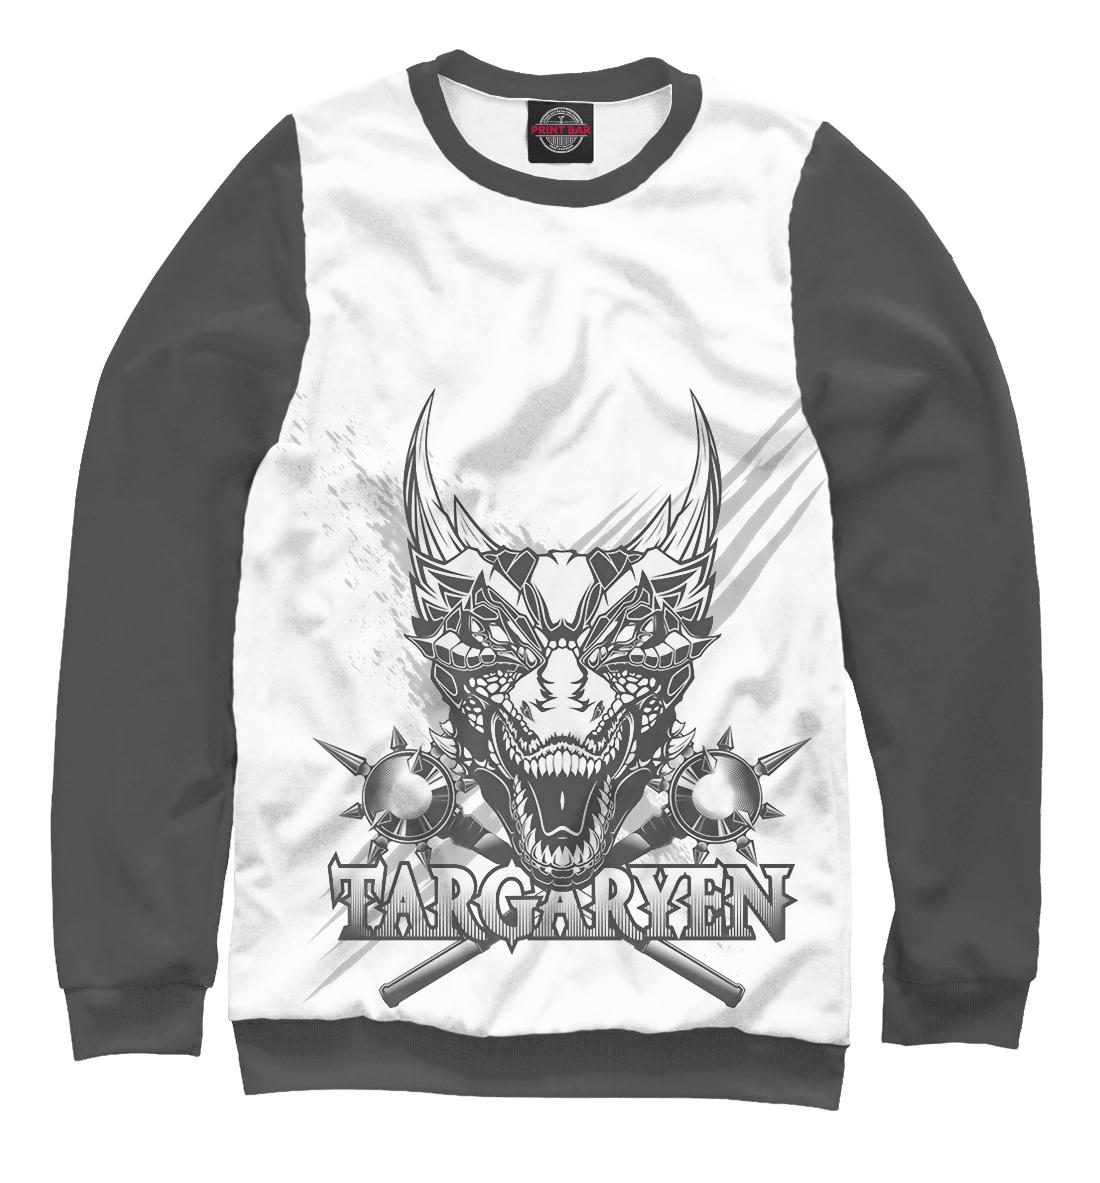 Купить Game of Thrones targaryen, Printbar, Свитшоты, IGR-916372-swi-1